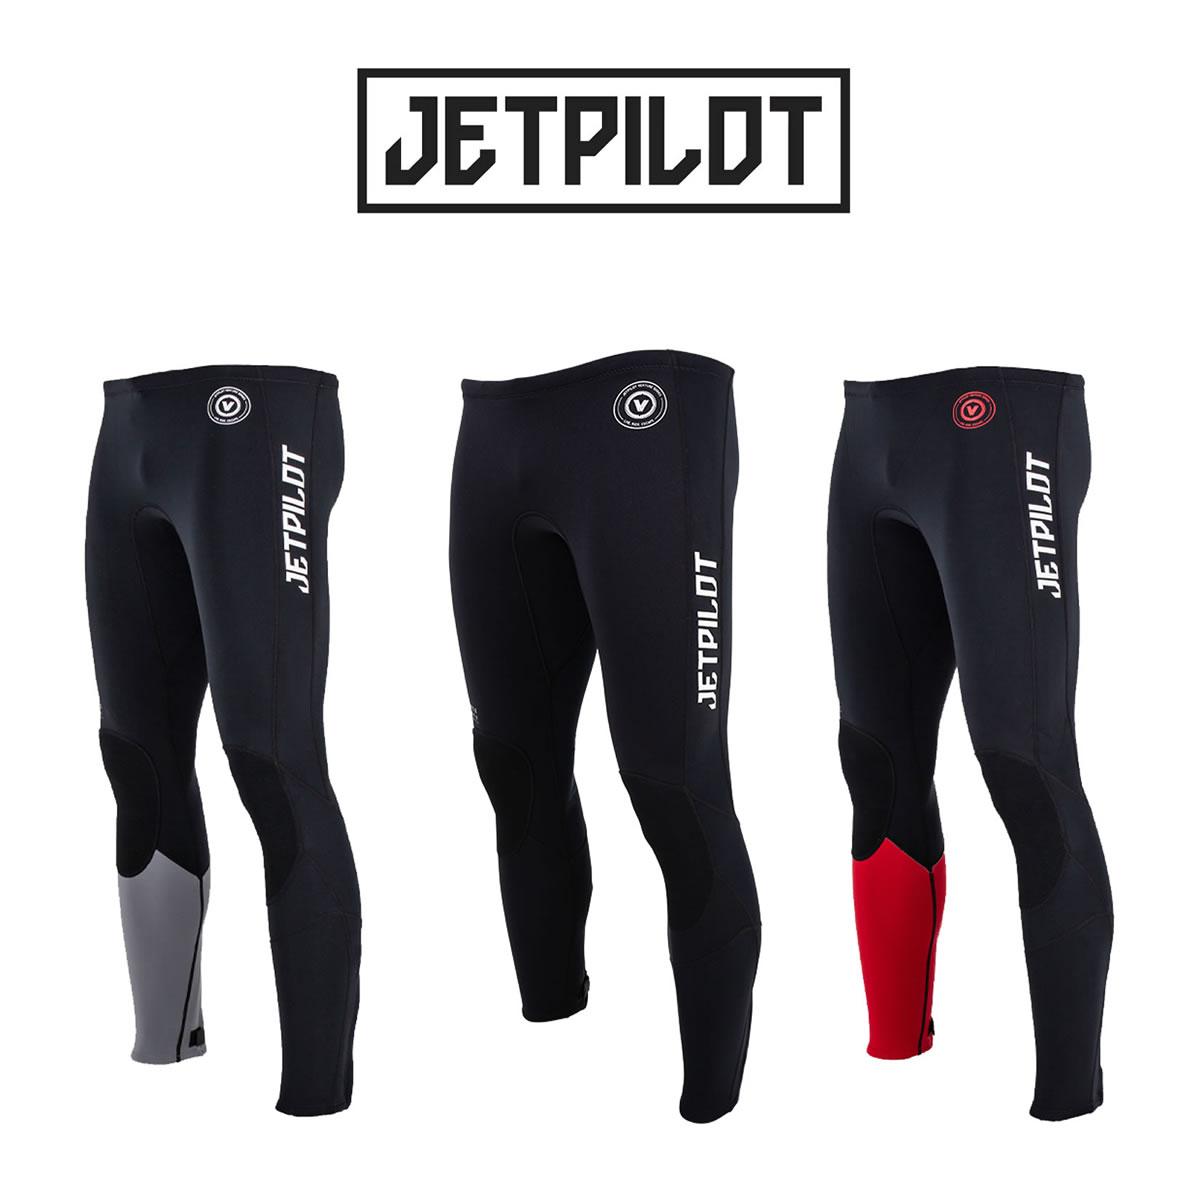 JETPILOT(ジェットパイロット)ウエットパンツ VENTUREネオパンツ(JA21153)